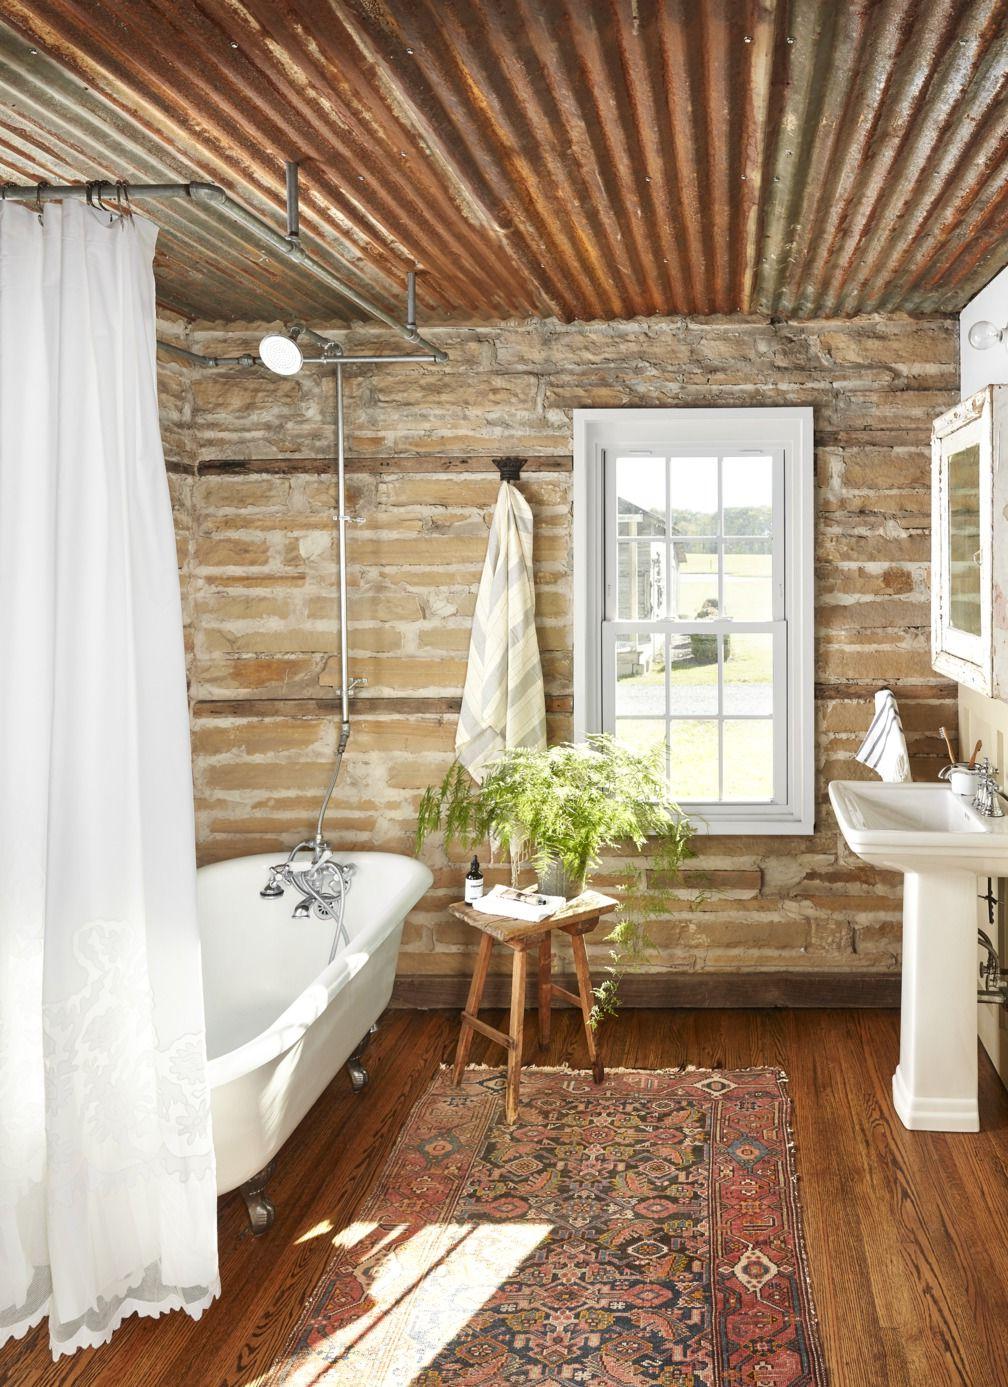 Salle de bains campagne chic.